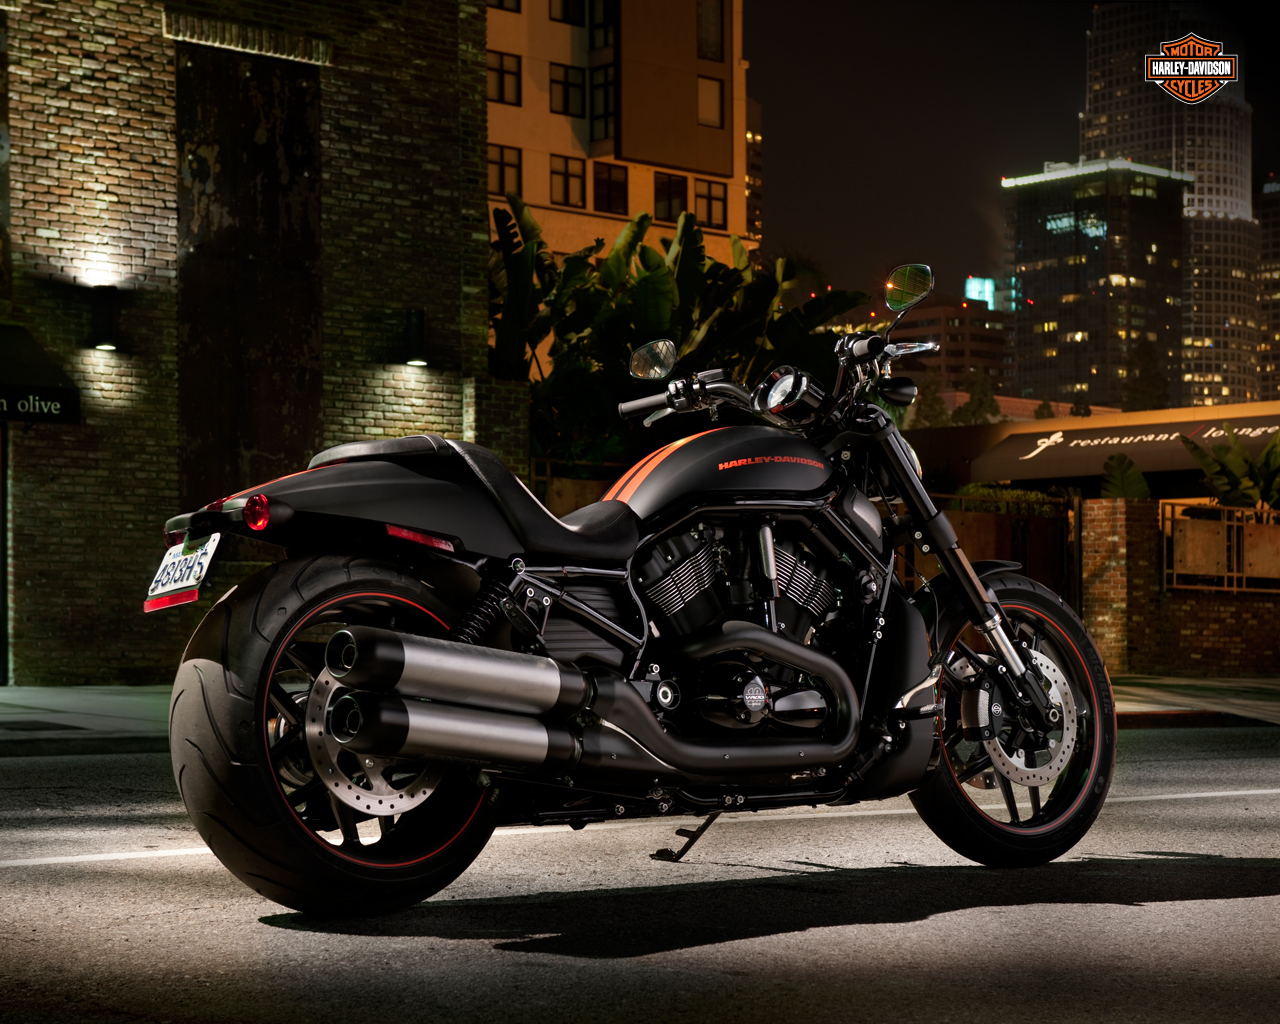 2012 Harley Davidson Vrscdx Night Rod Special: China Dress Dublog: Harley-Davidson VRSCDX Night Rod